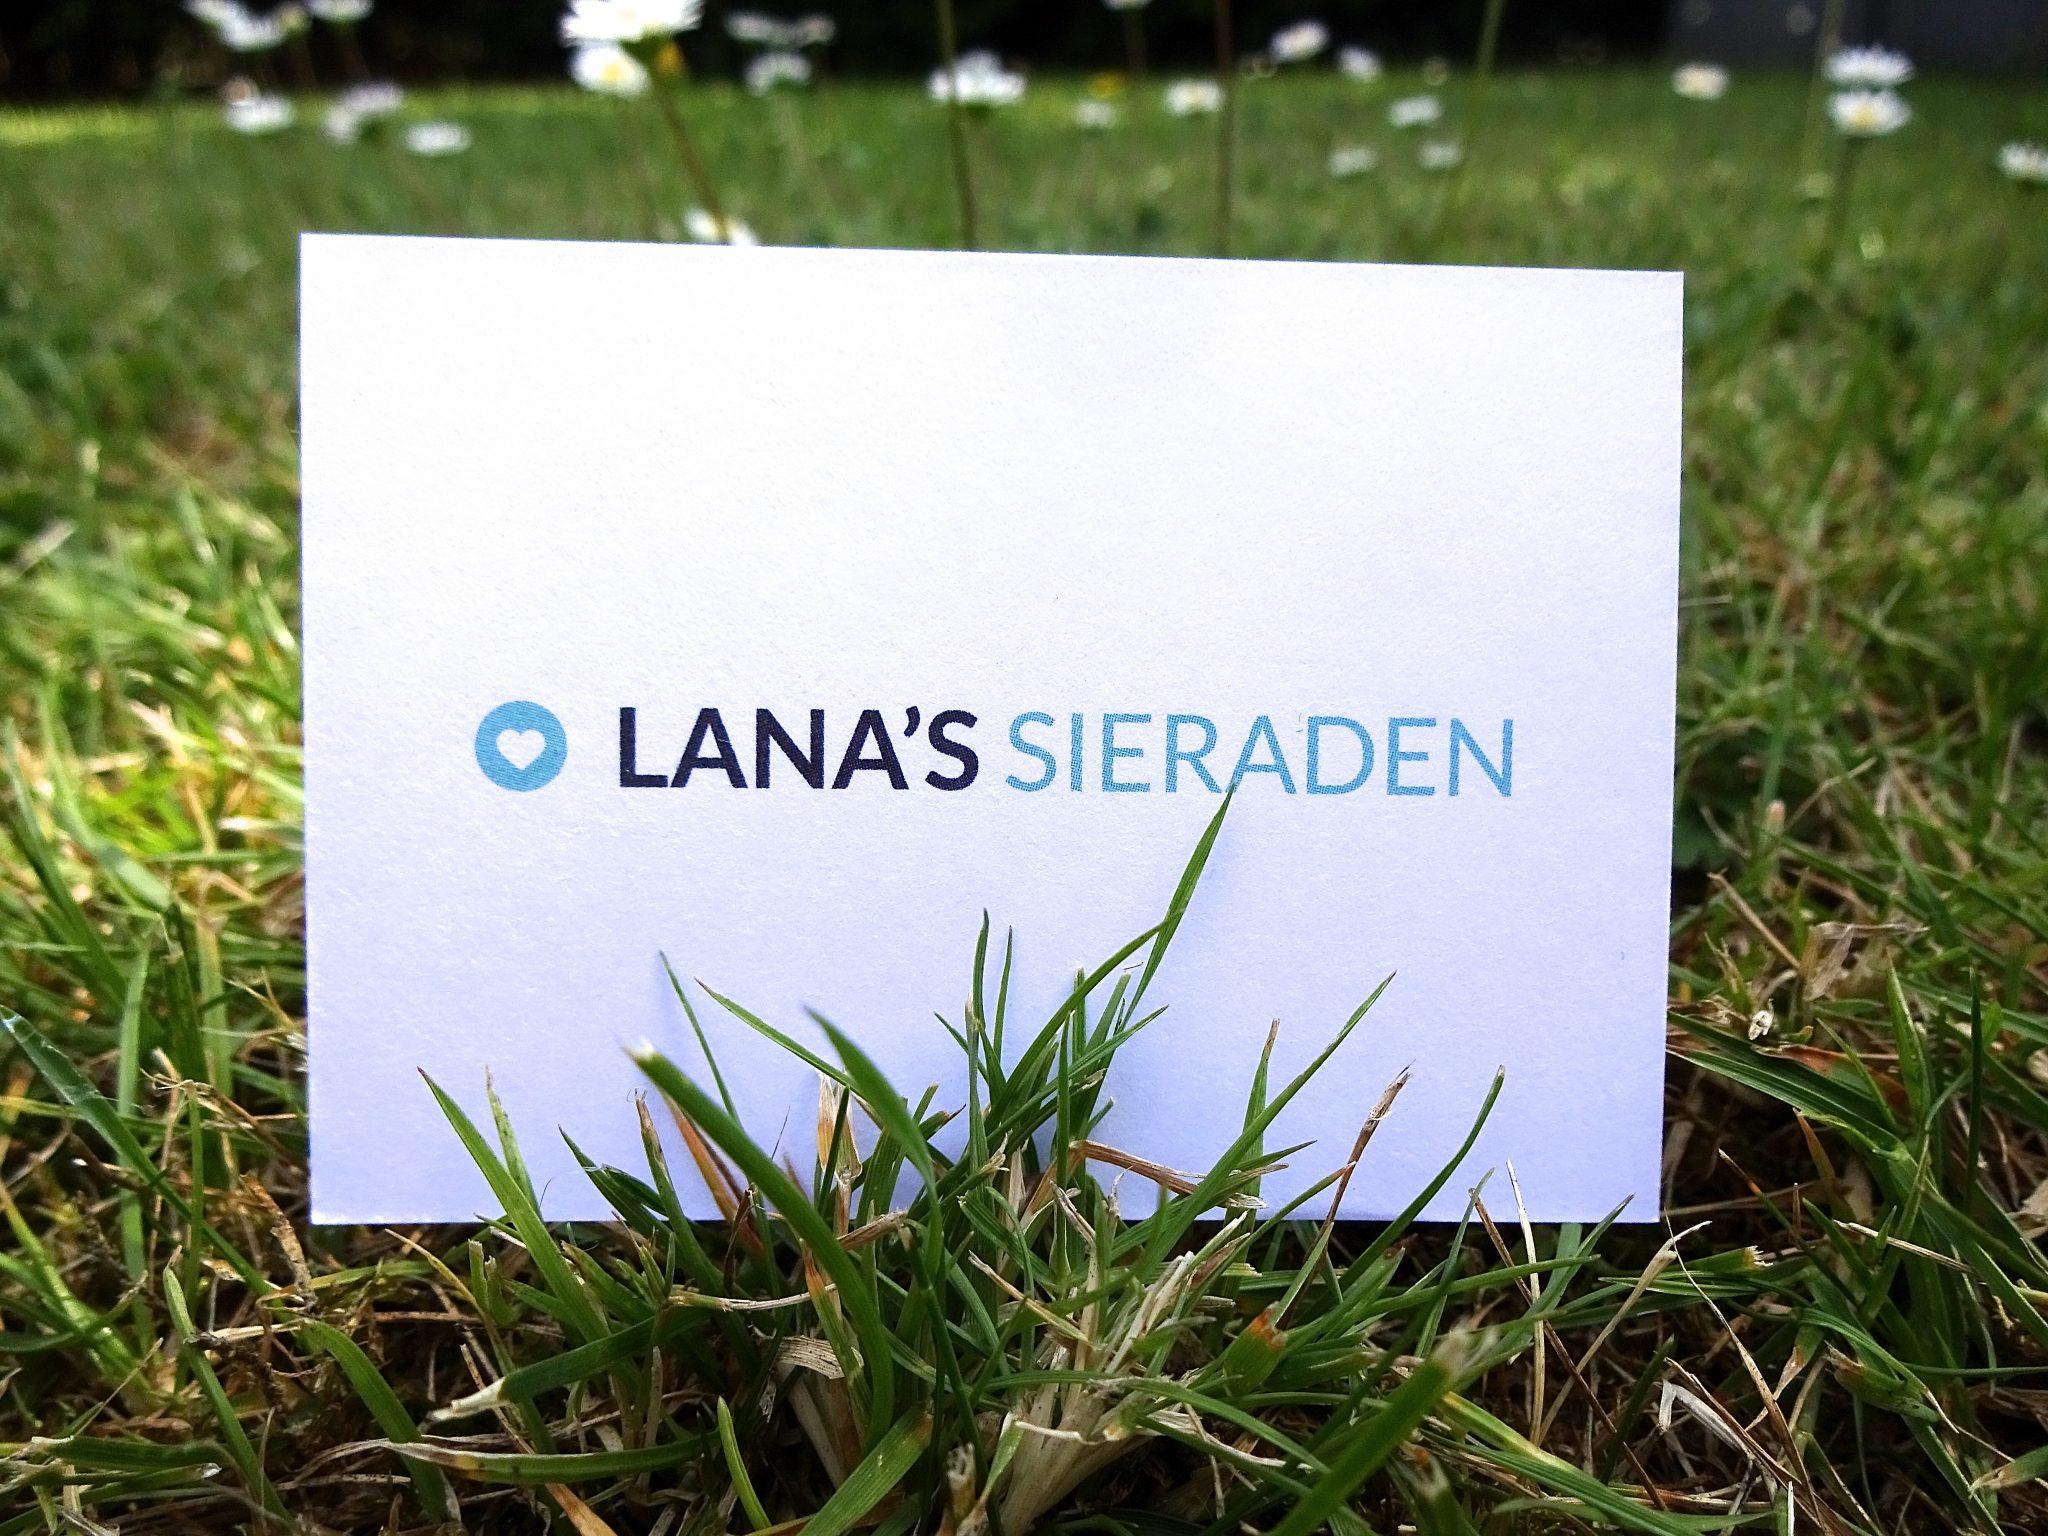 Lana's Sieraden